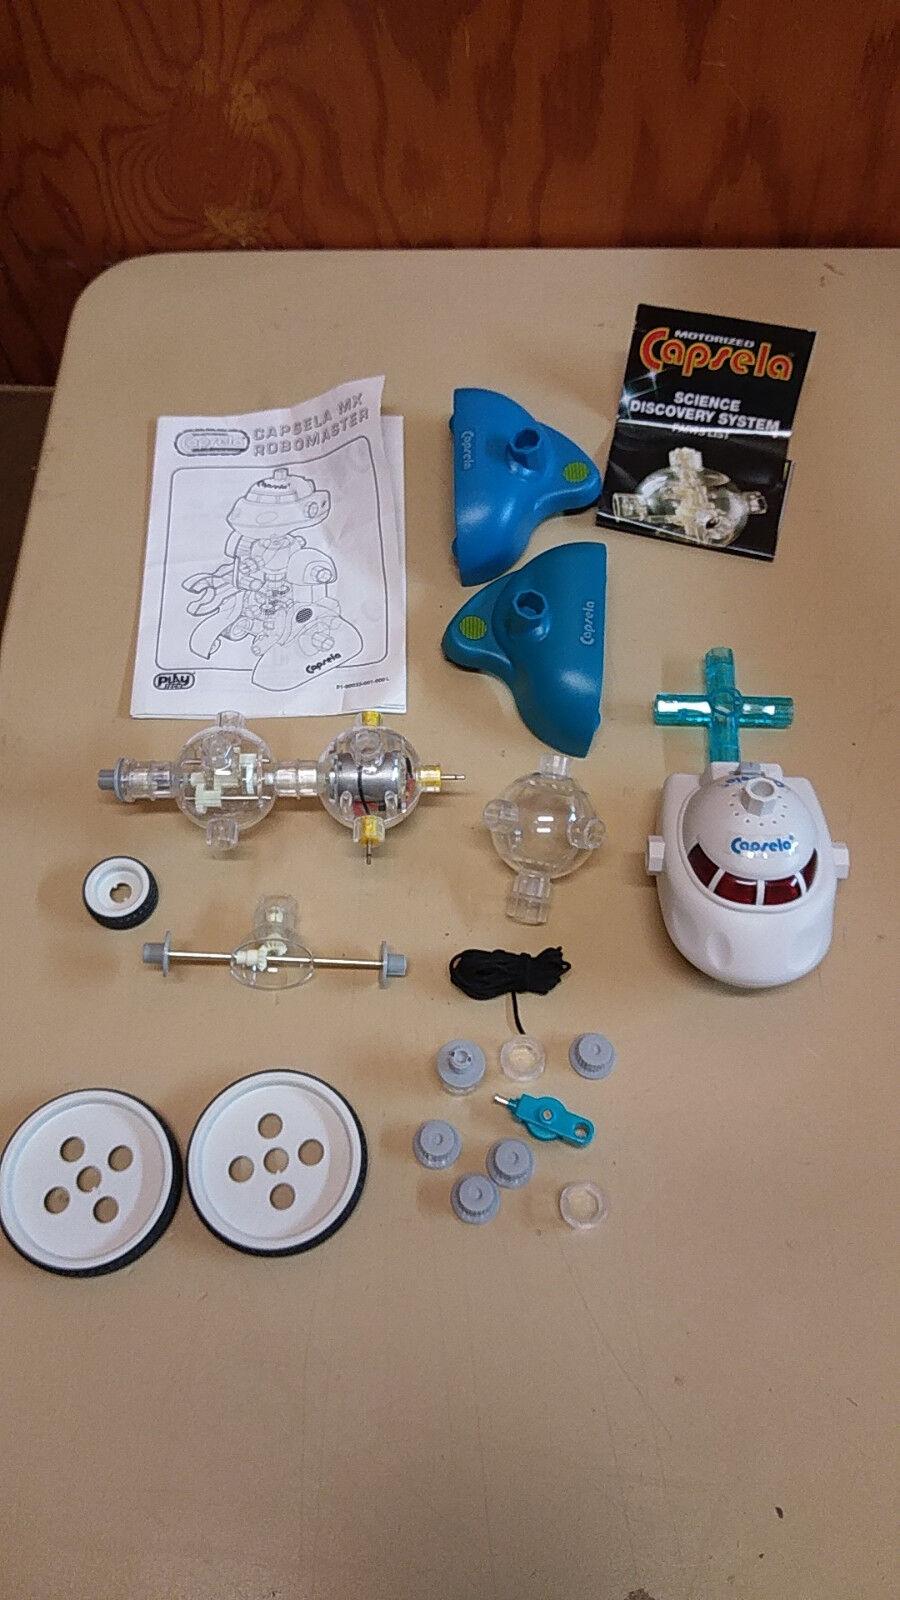 Capsela Robo Head Motor Drivetrain And Other Parts Pieces